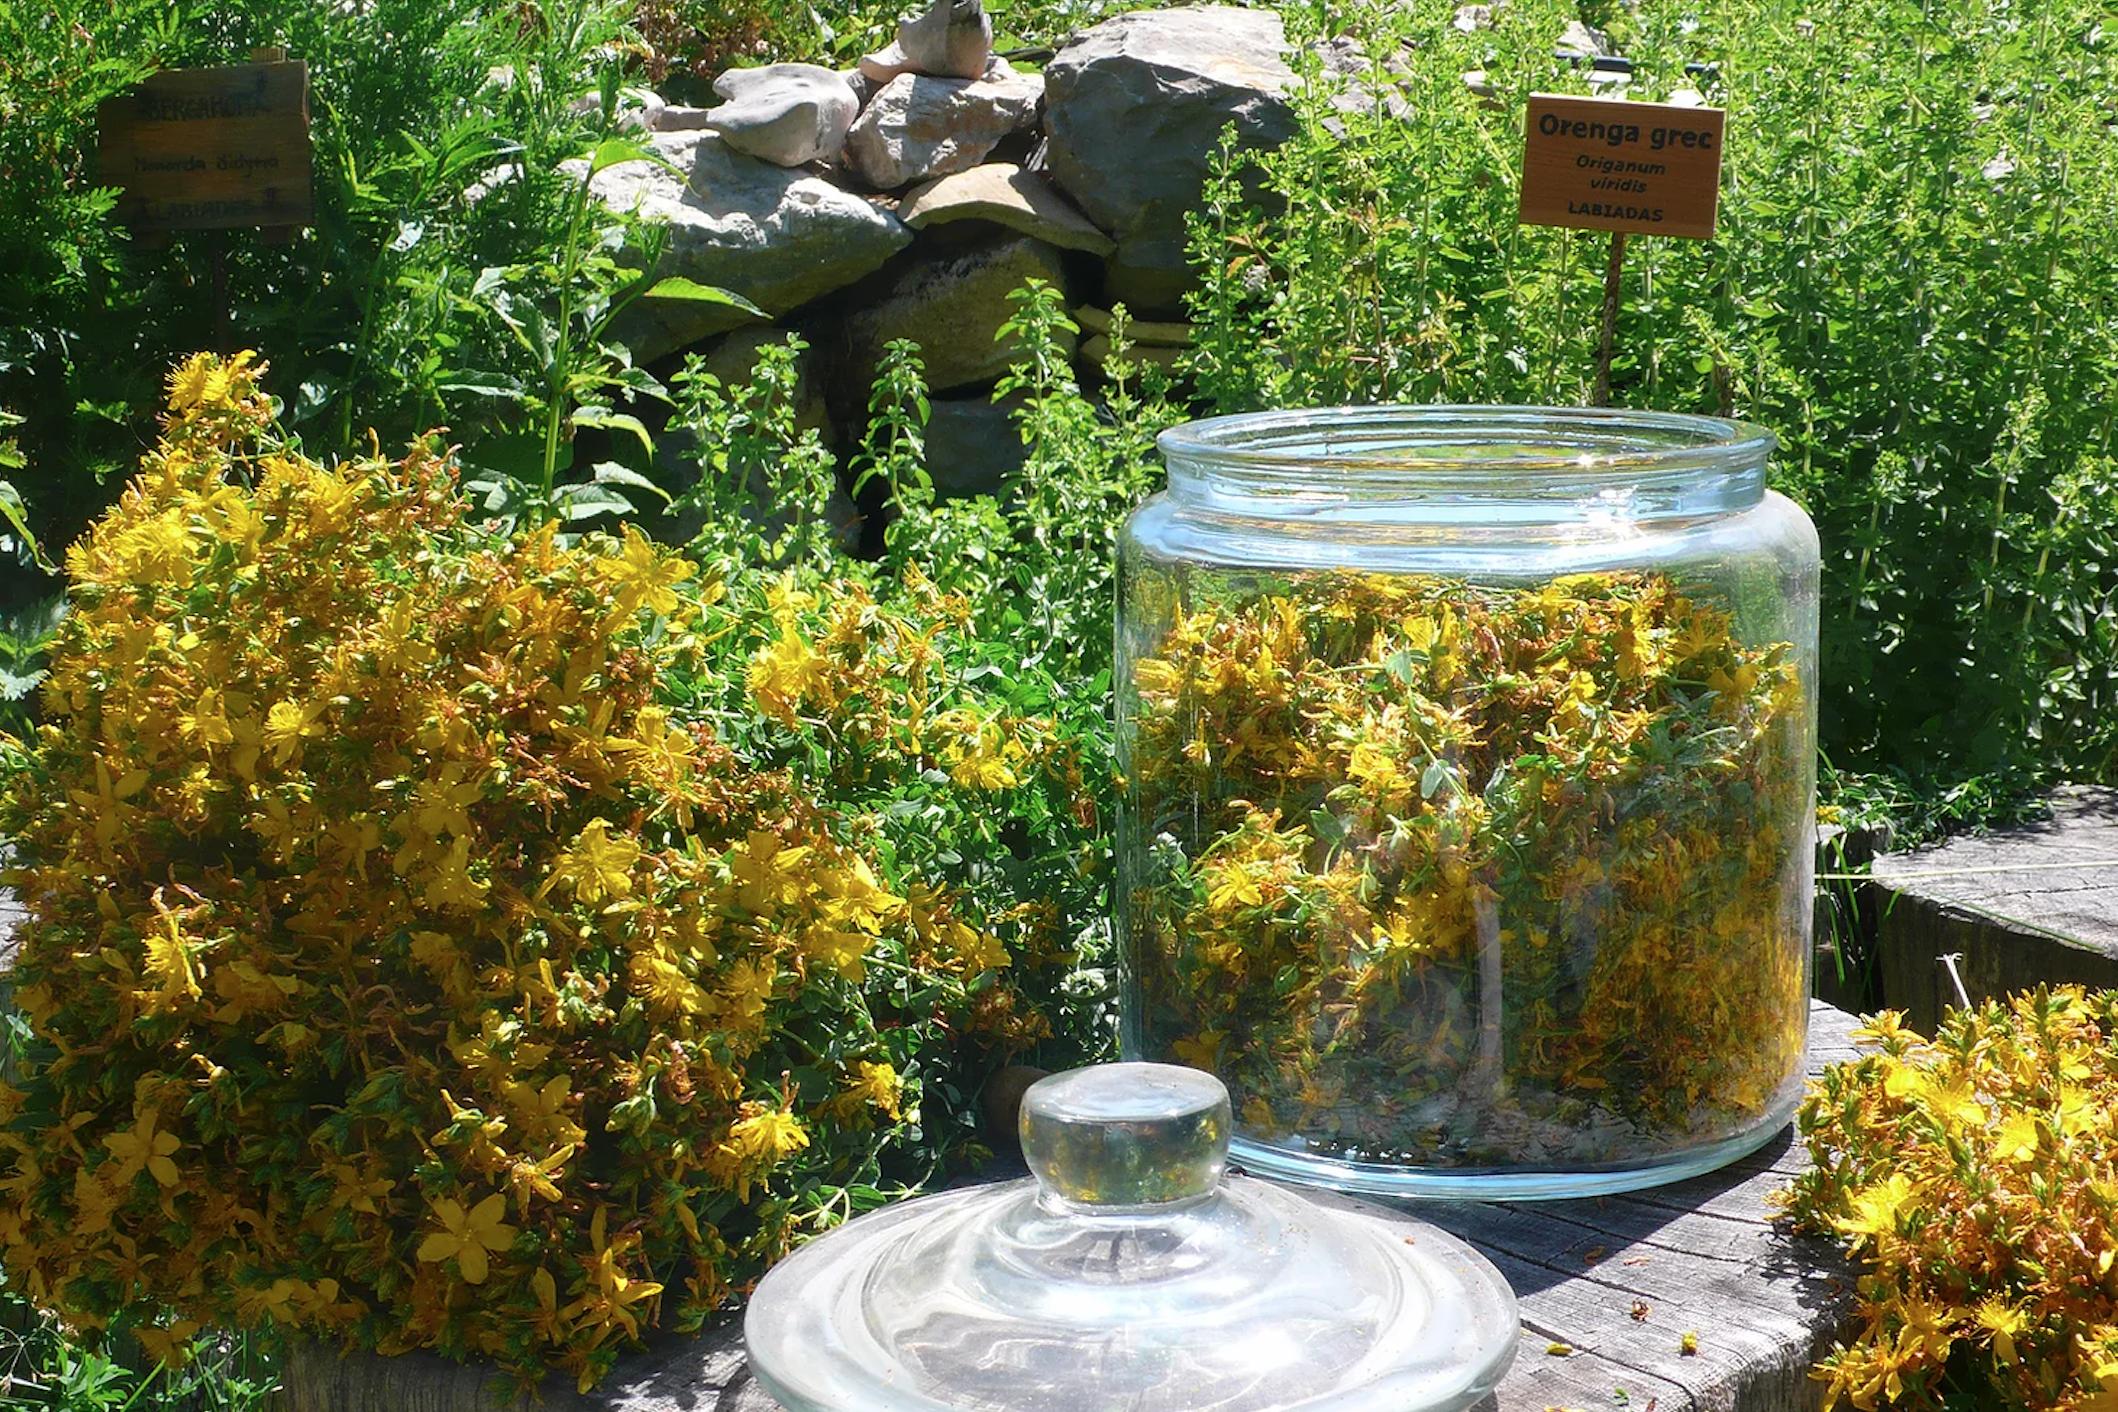 Herbes de l'Herboristeria Nogué   herbesossera.com